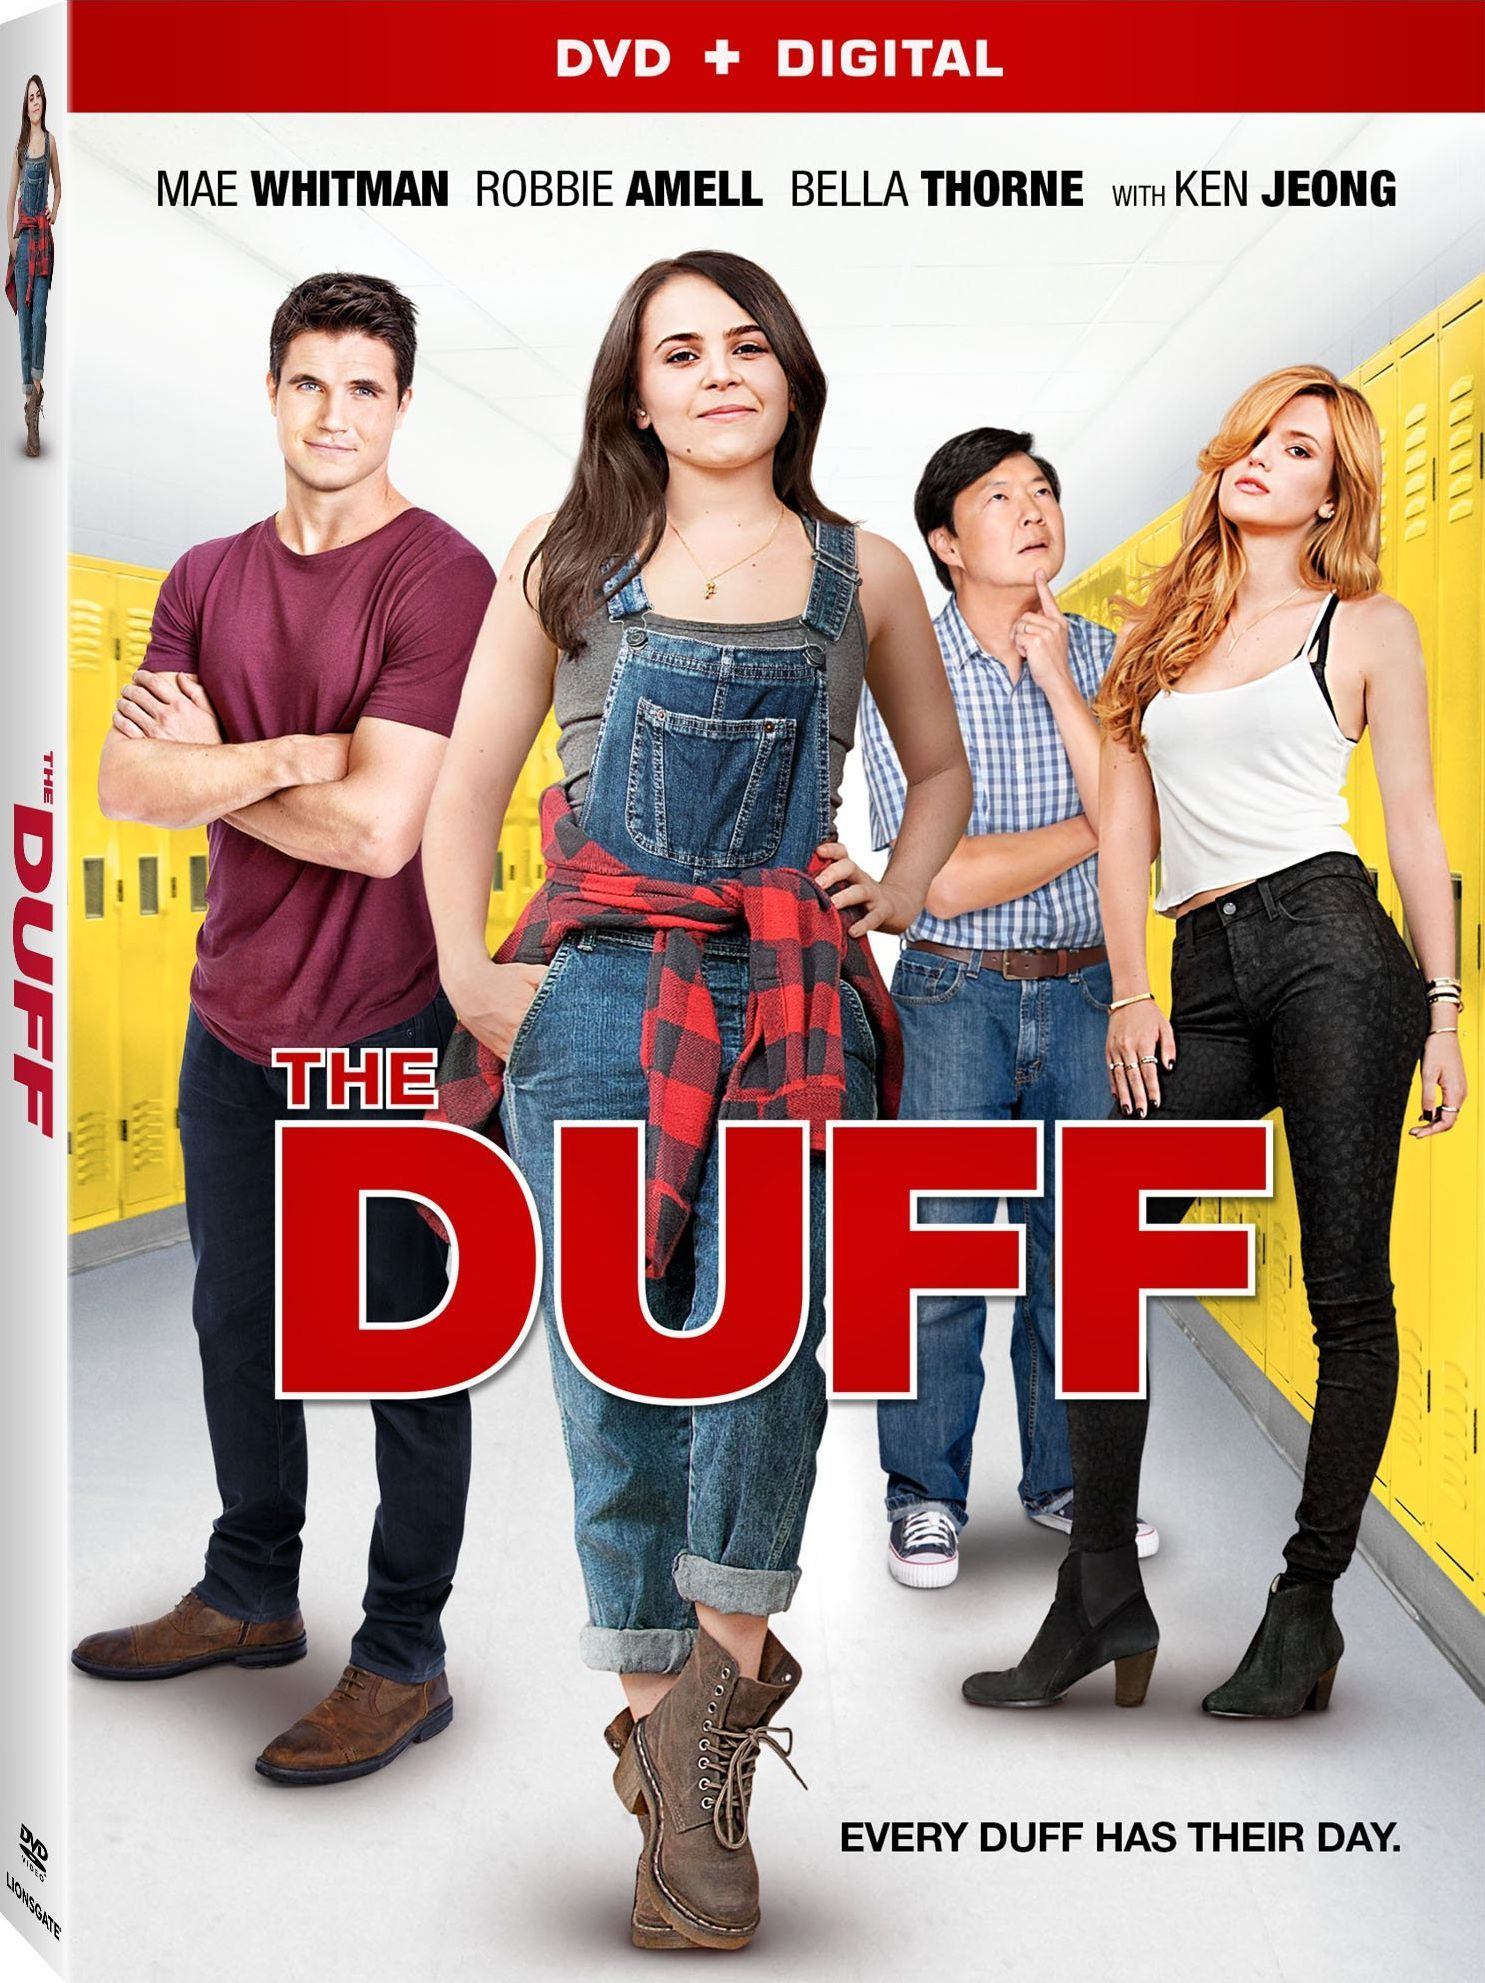 The Duff Dvd Release Date June 9 2015 Peliculas Mae Whitman Peliculas Para Adolescentes